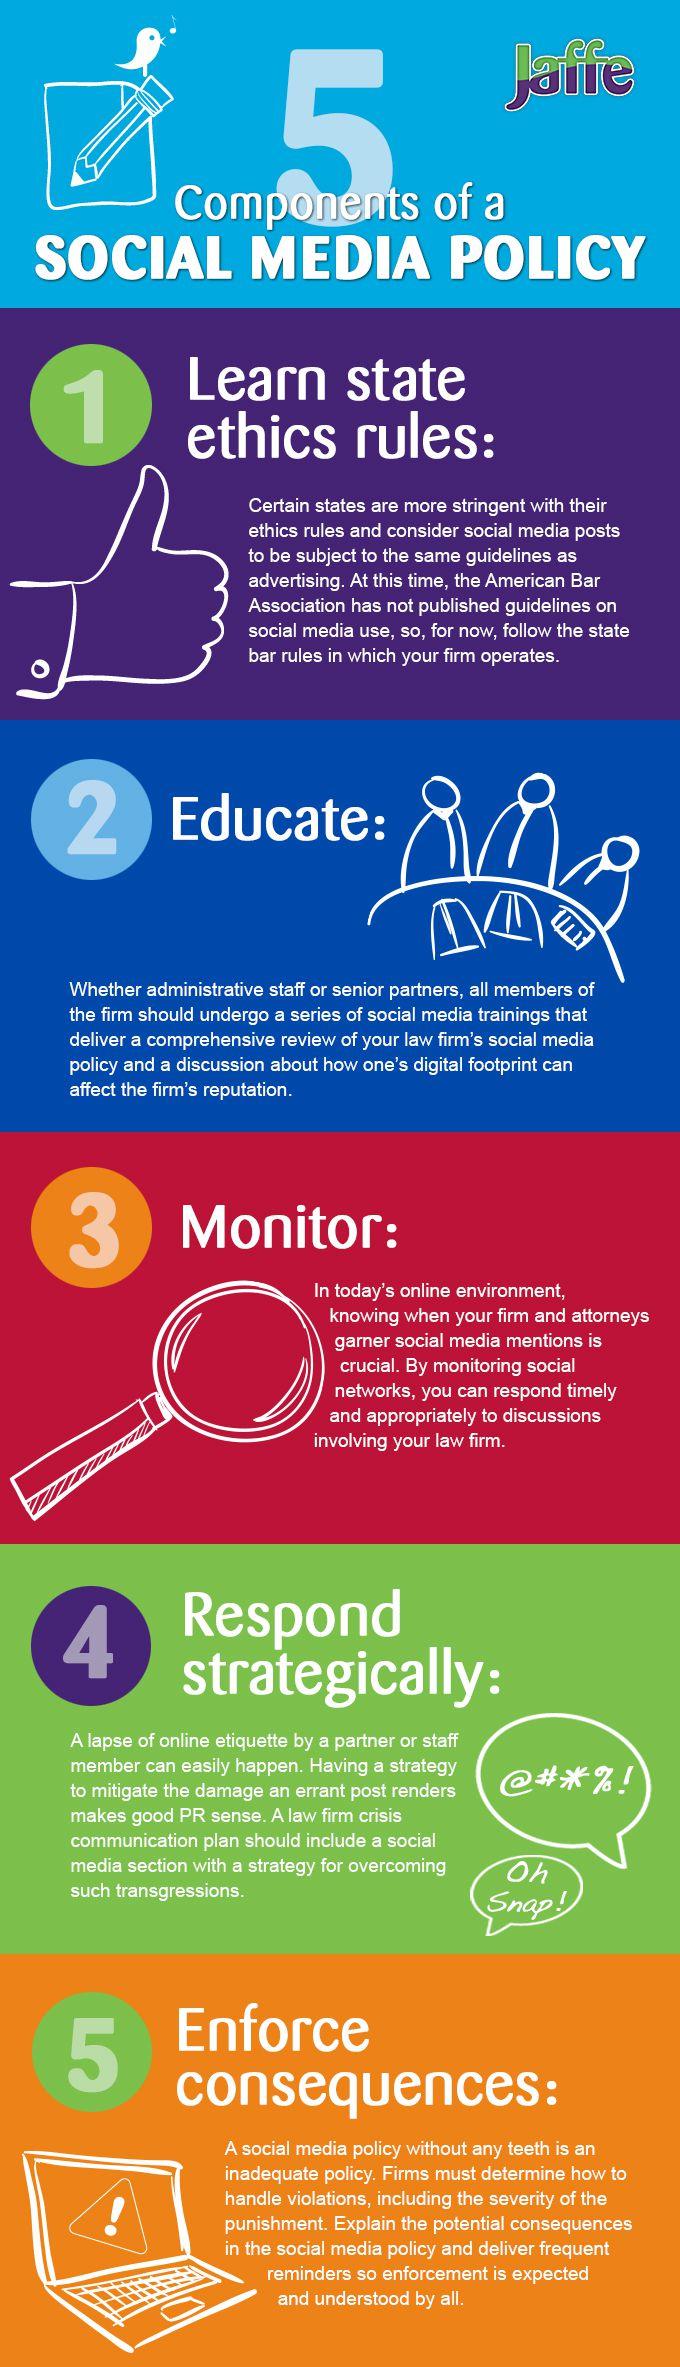 004 Top Social Media Policy Template Sample  Example Nz Australia Free UkFull